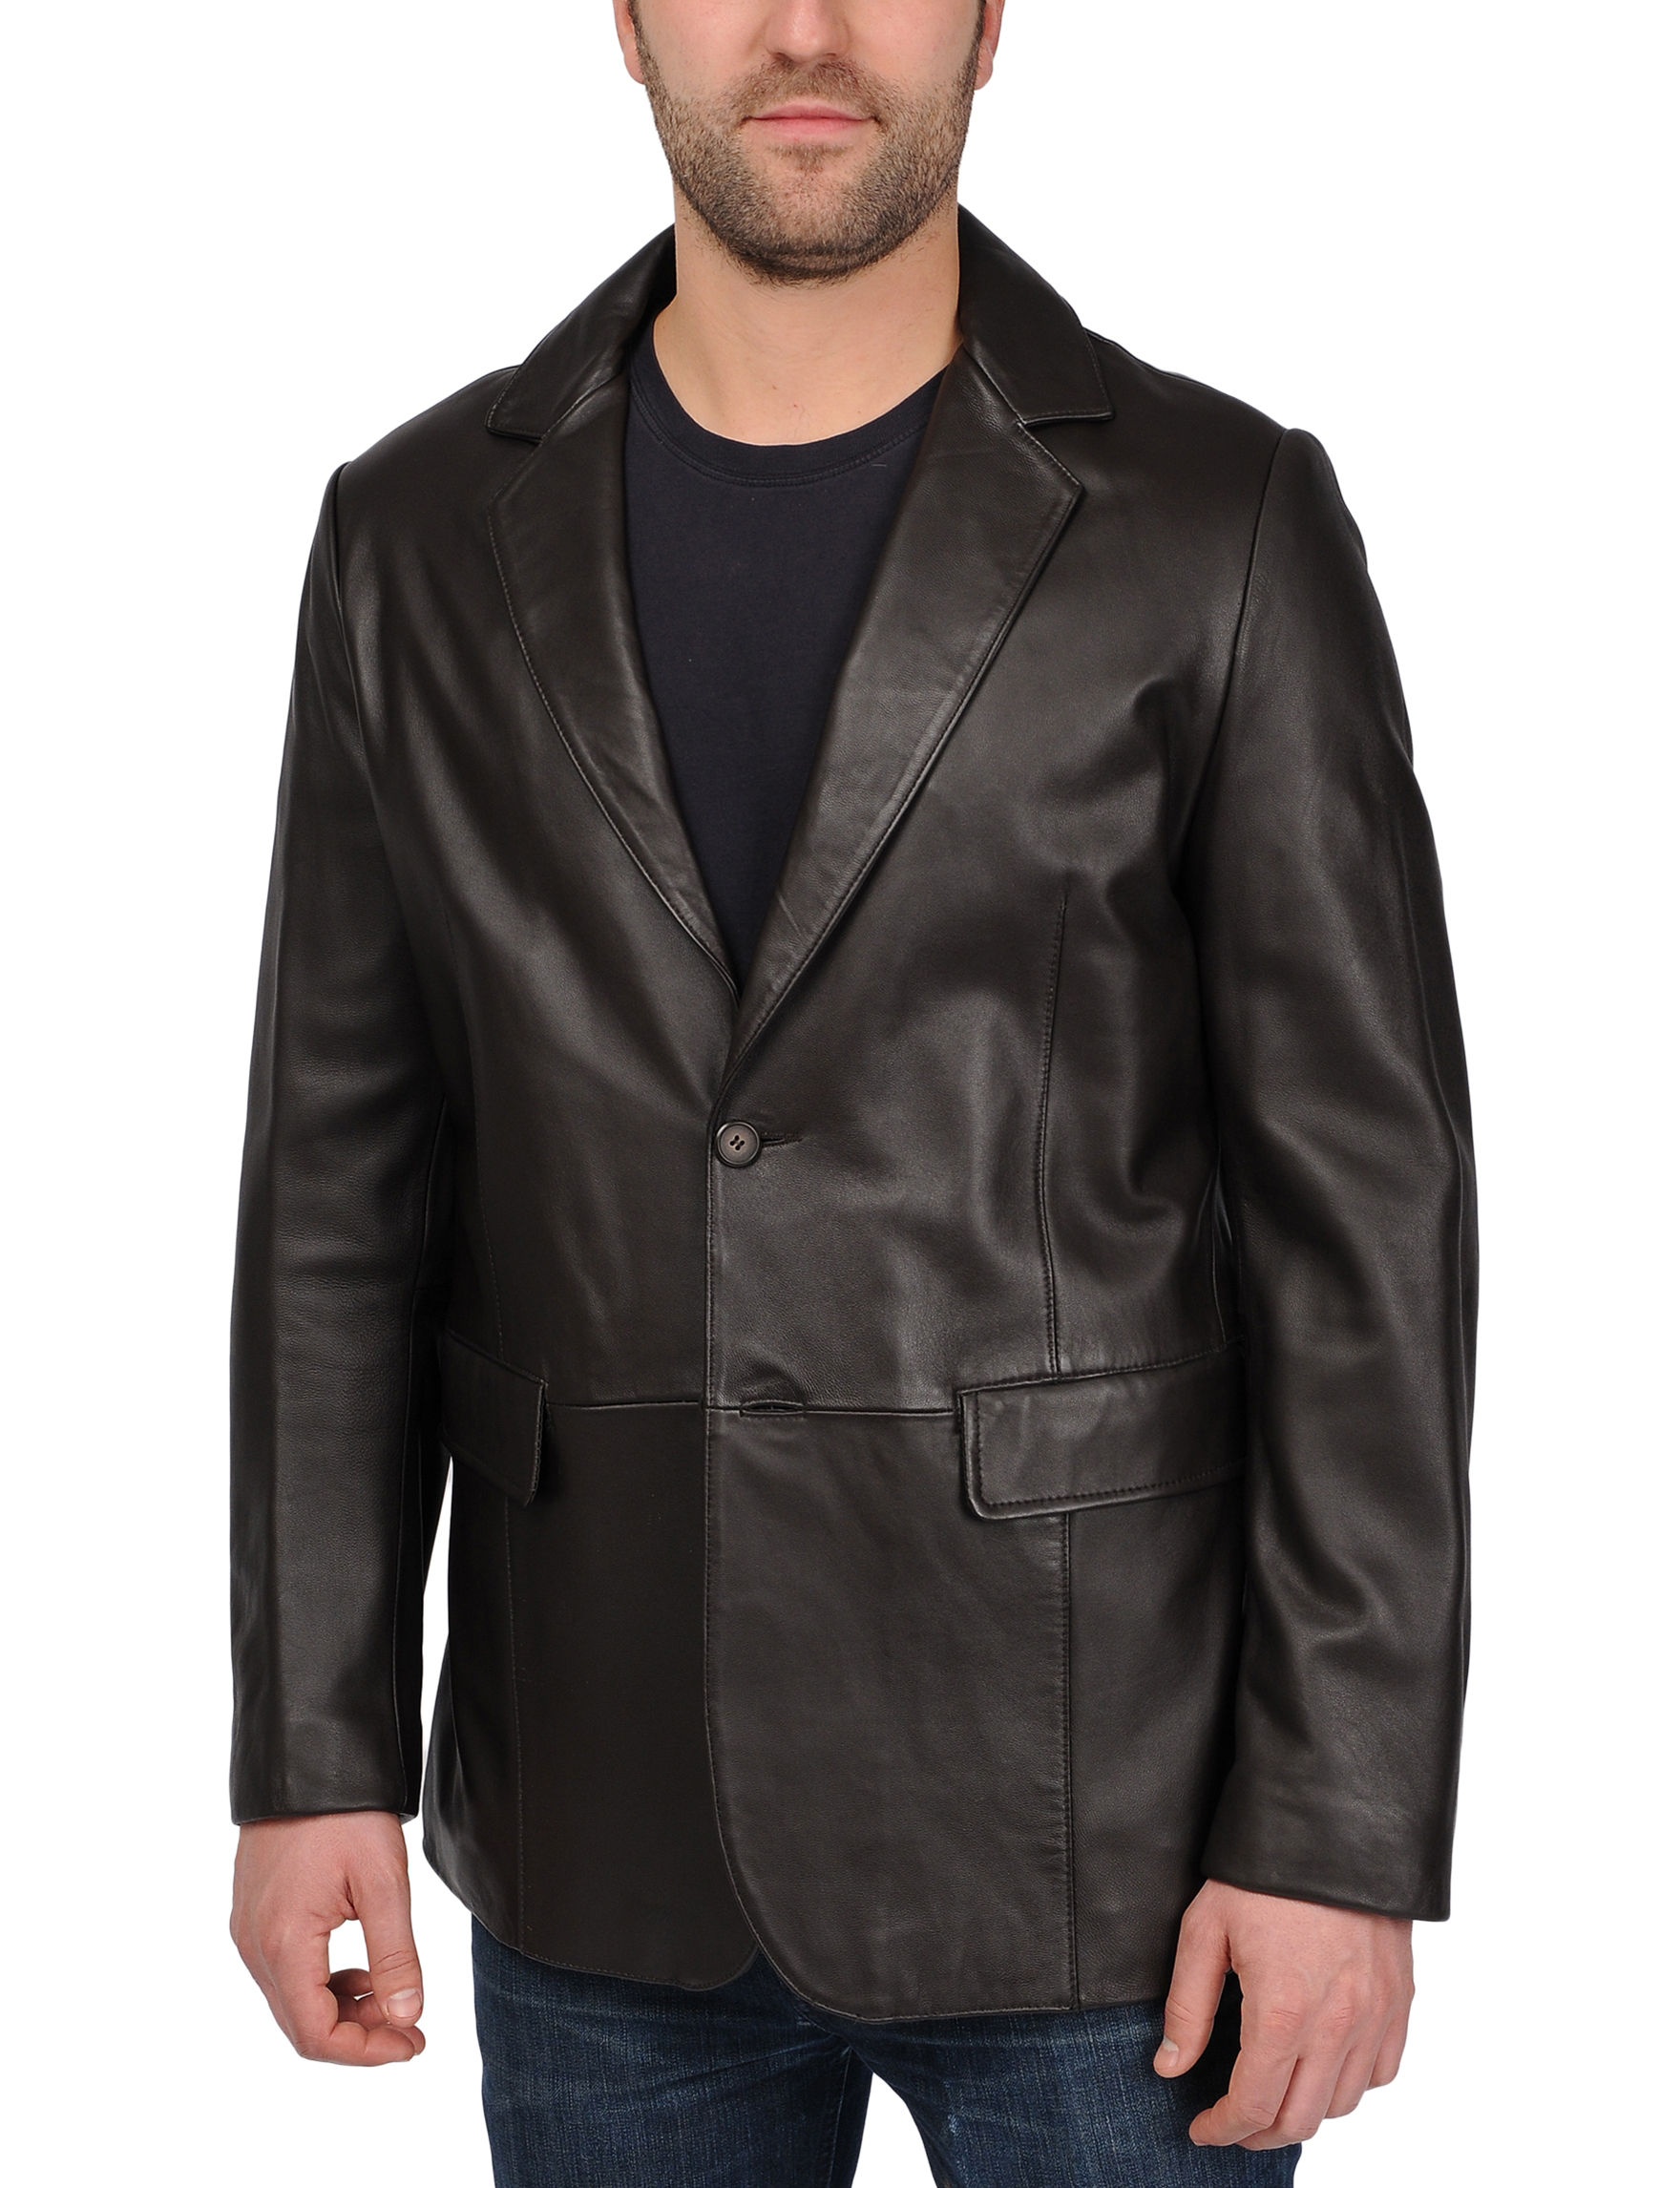 Excelled Black Lightweight Jackets & Blazers